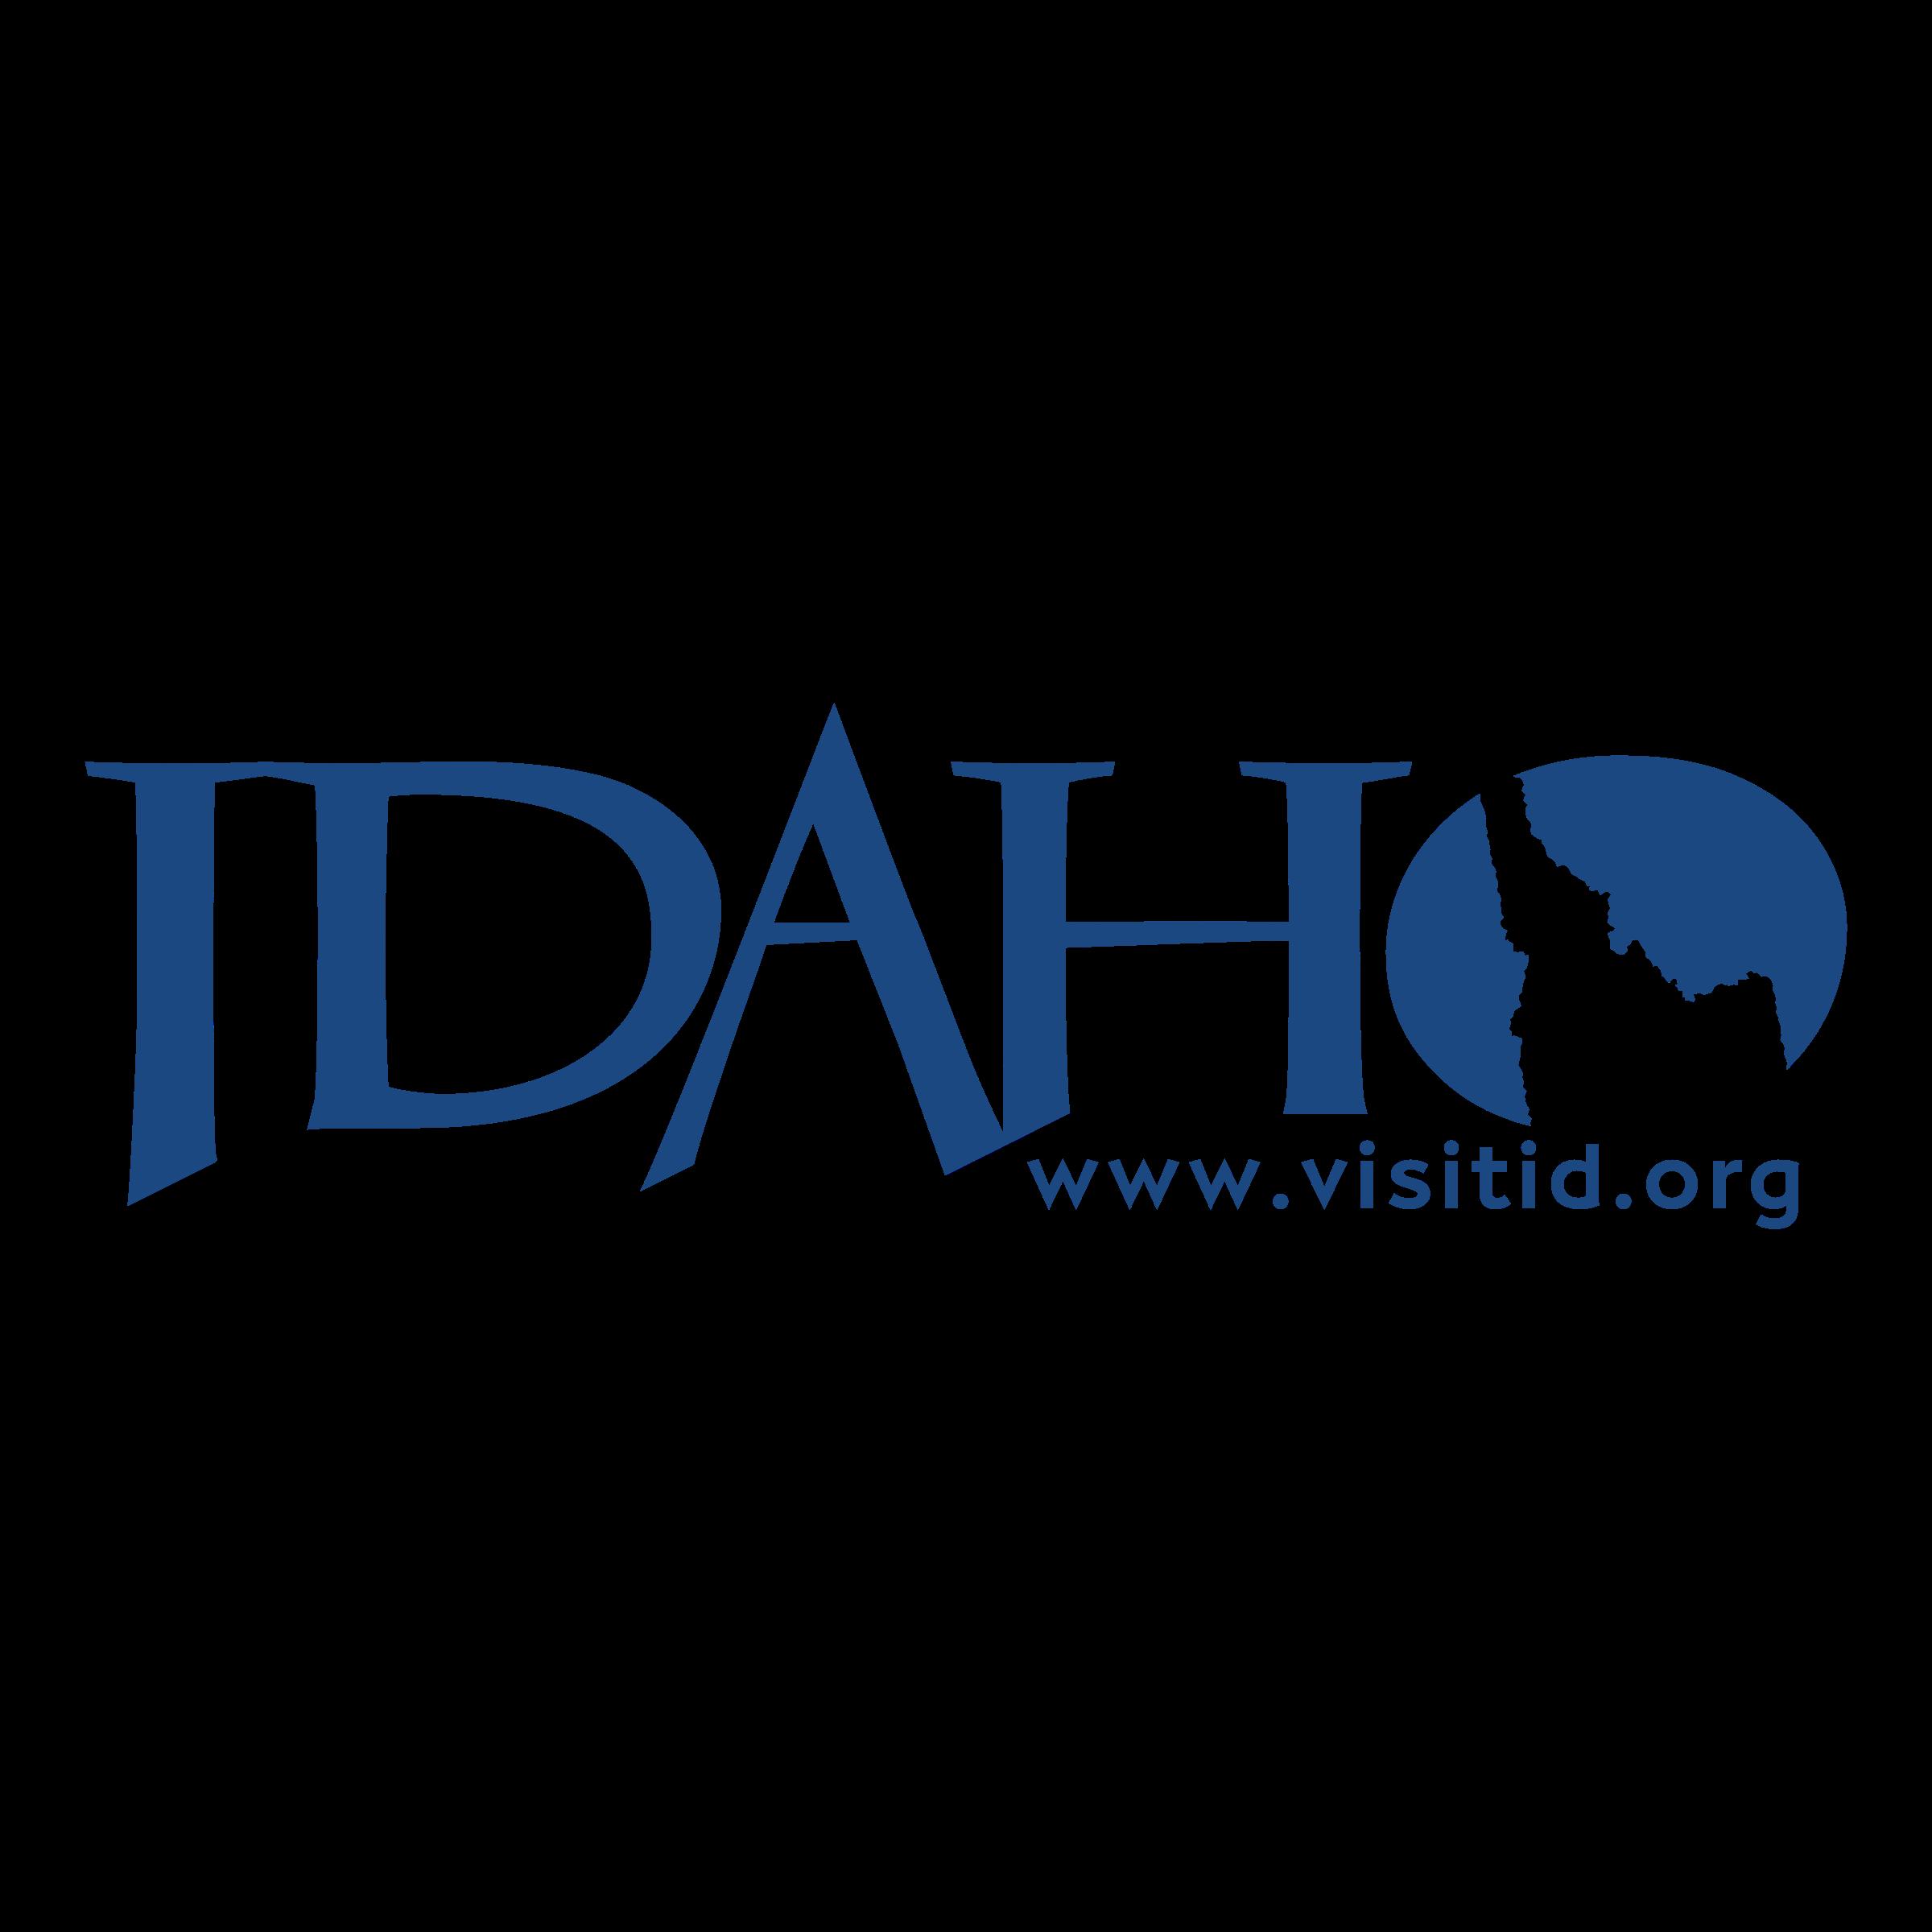 Idaho Logo PNG Transparent & SVG Vector.